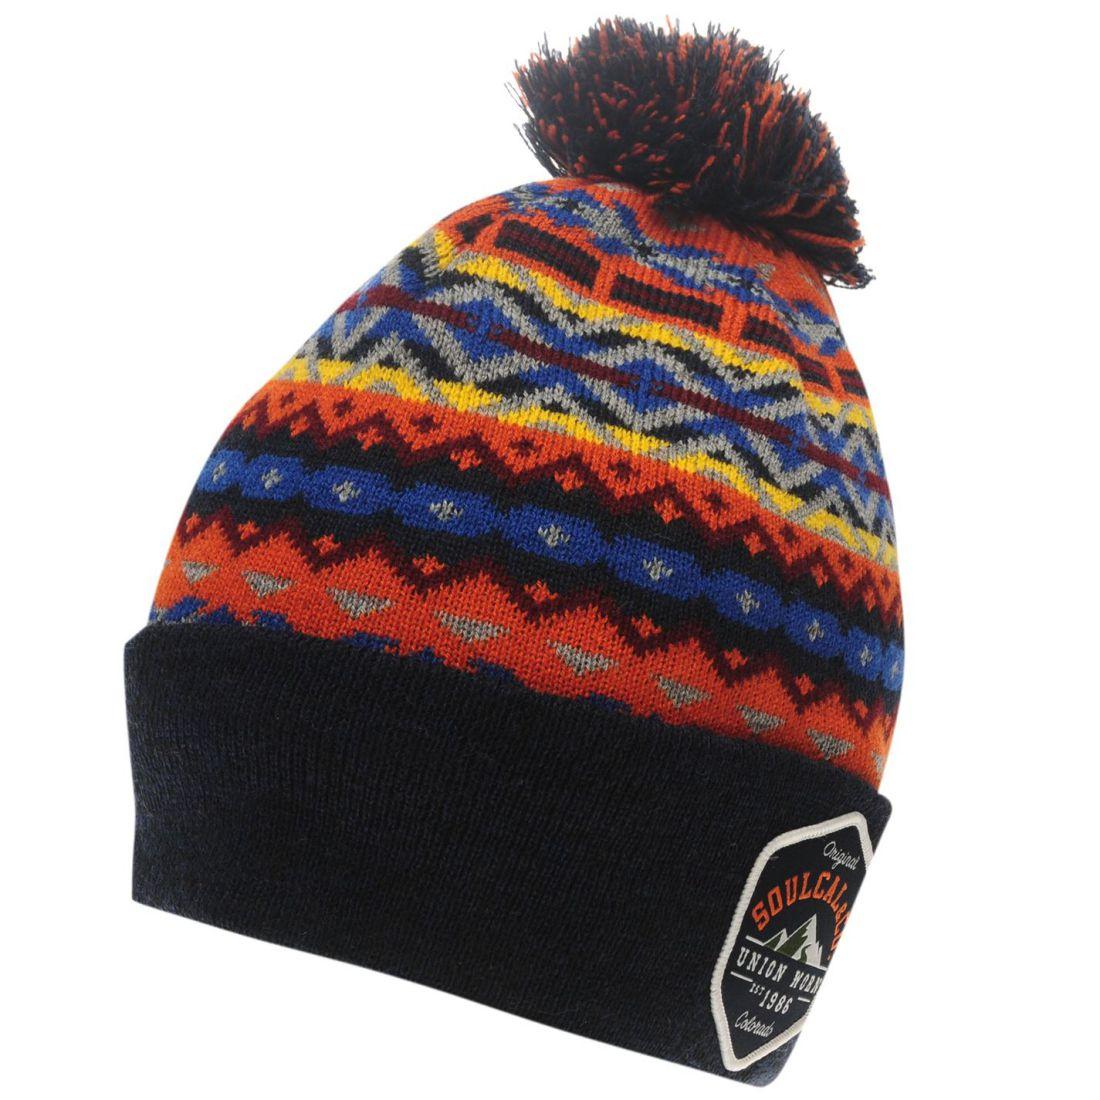 SoulCal Mens Aztec Knit Hat Bobble Print  1f961ca4748